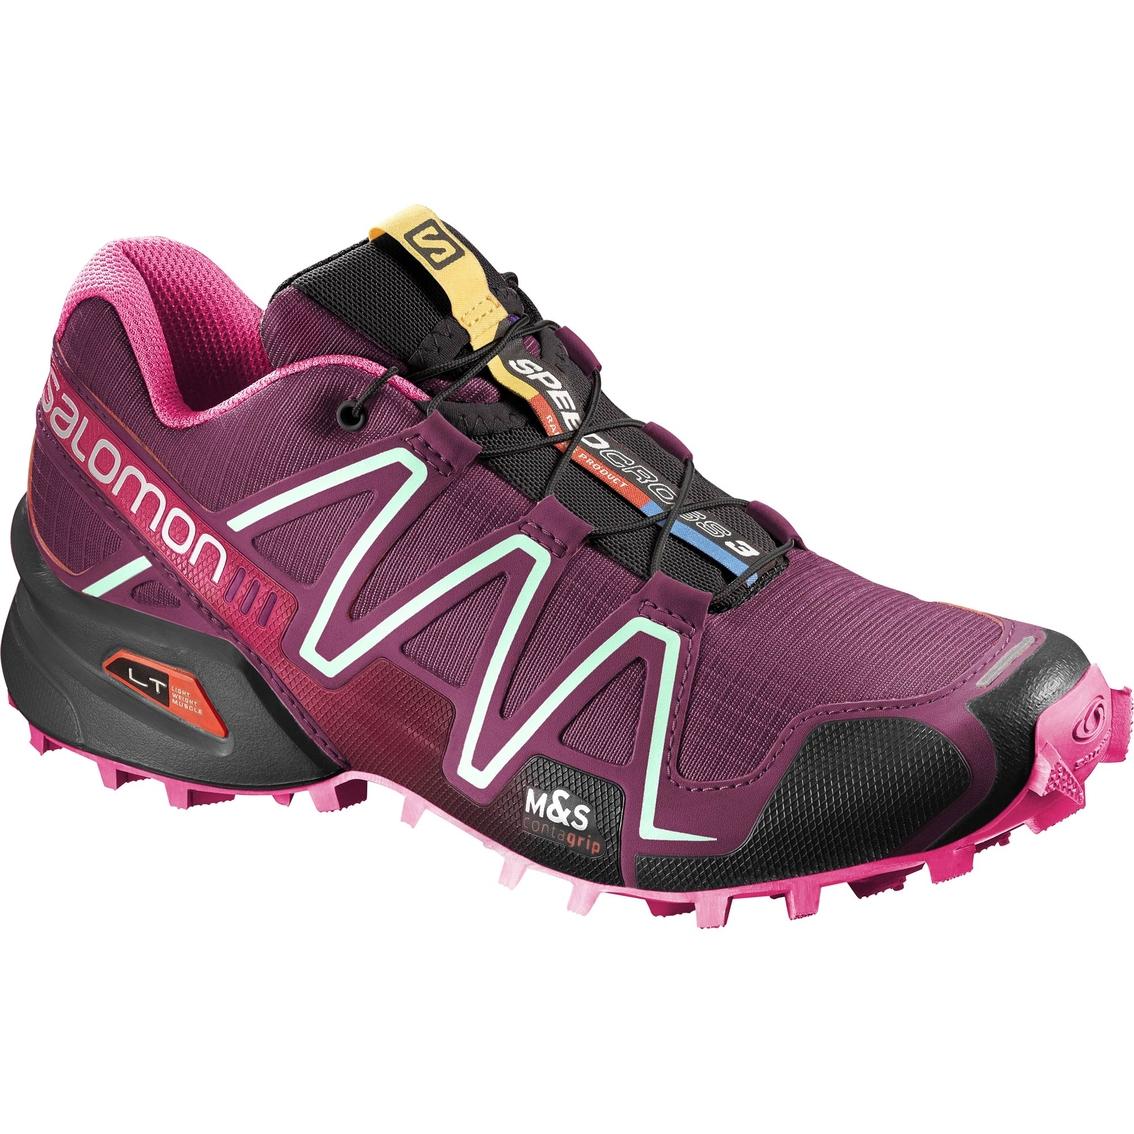 0452e14f822d Salomon Women s Speedcross 3 Trail Running Shoes